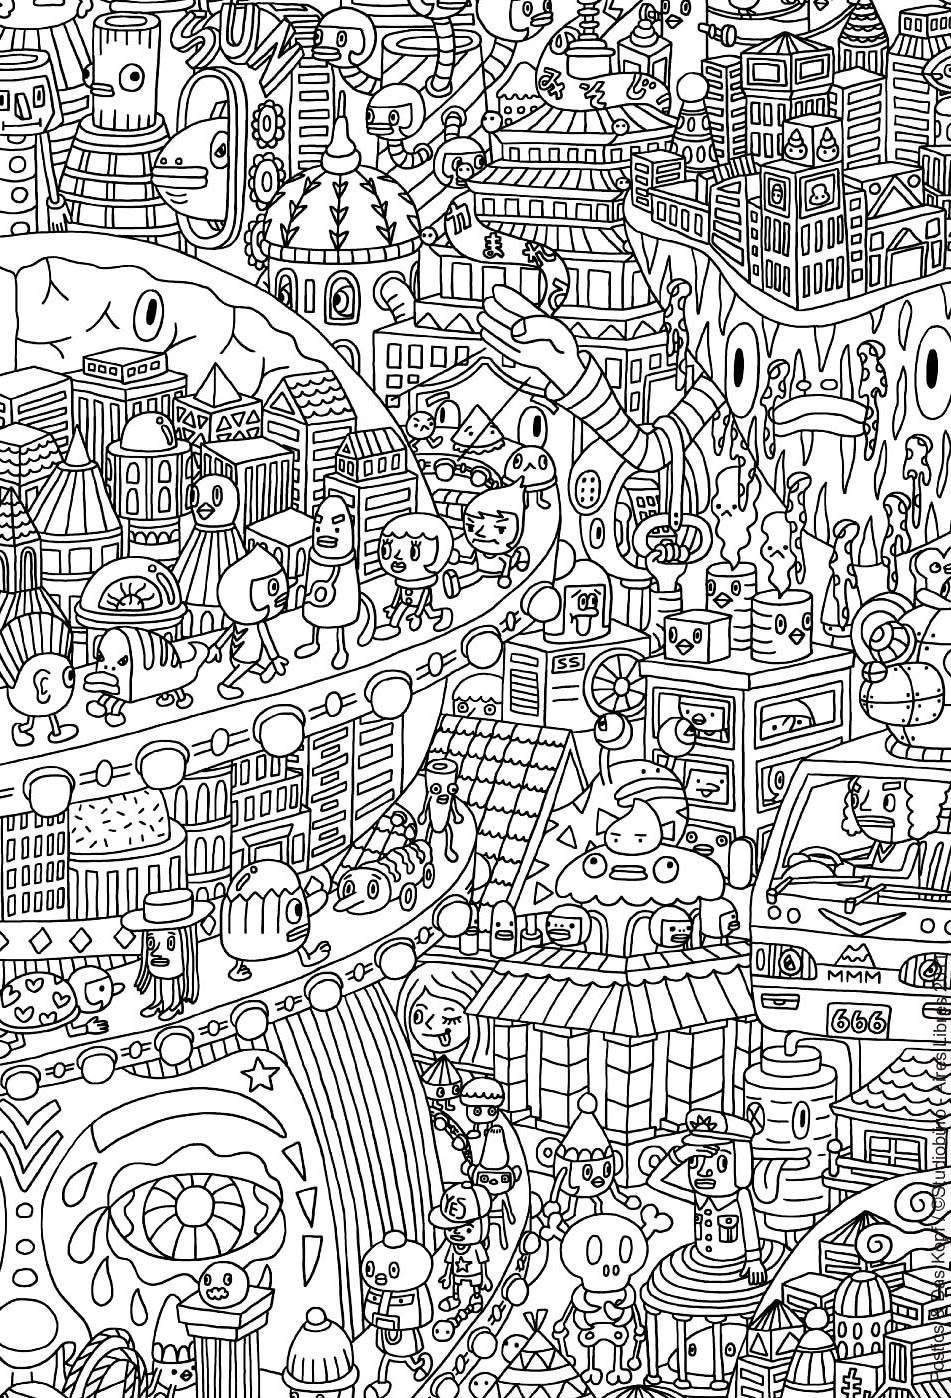 Disegni da colorare per adulti : Doodle art / Doodling - 11